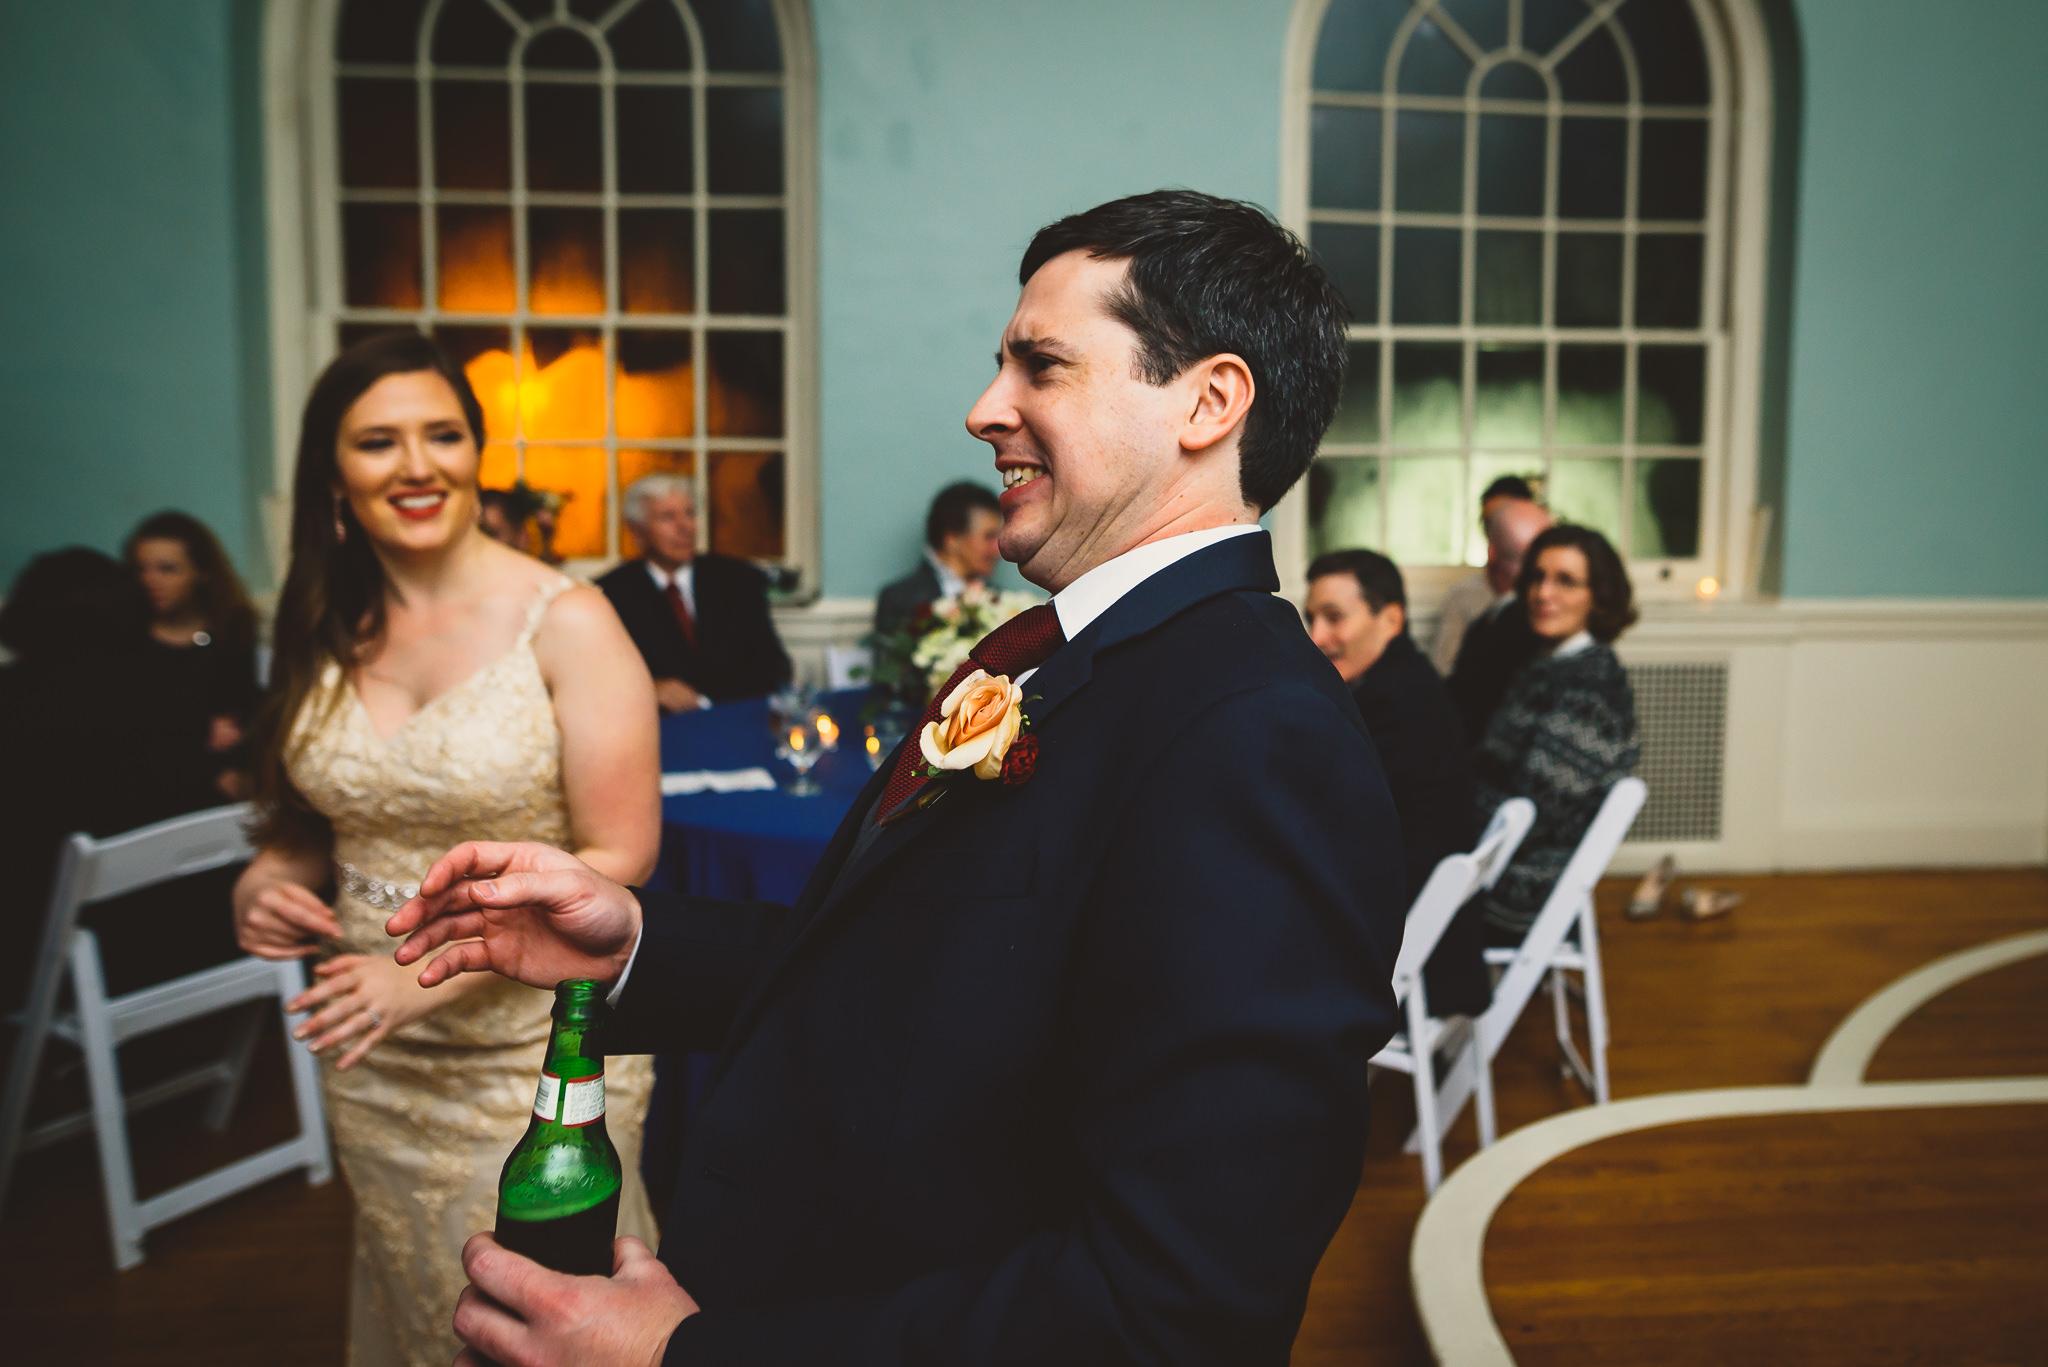 Colonial_Dames_Society_Wedding-0077.jpg